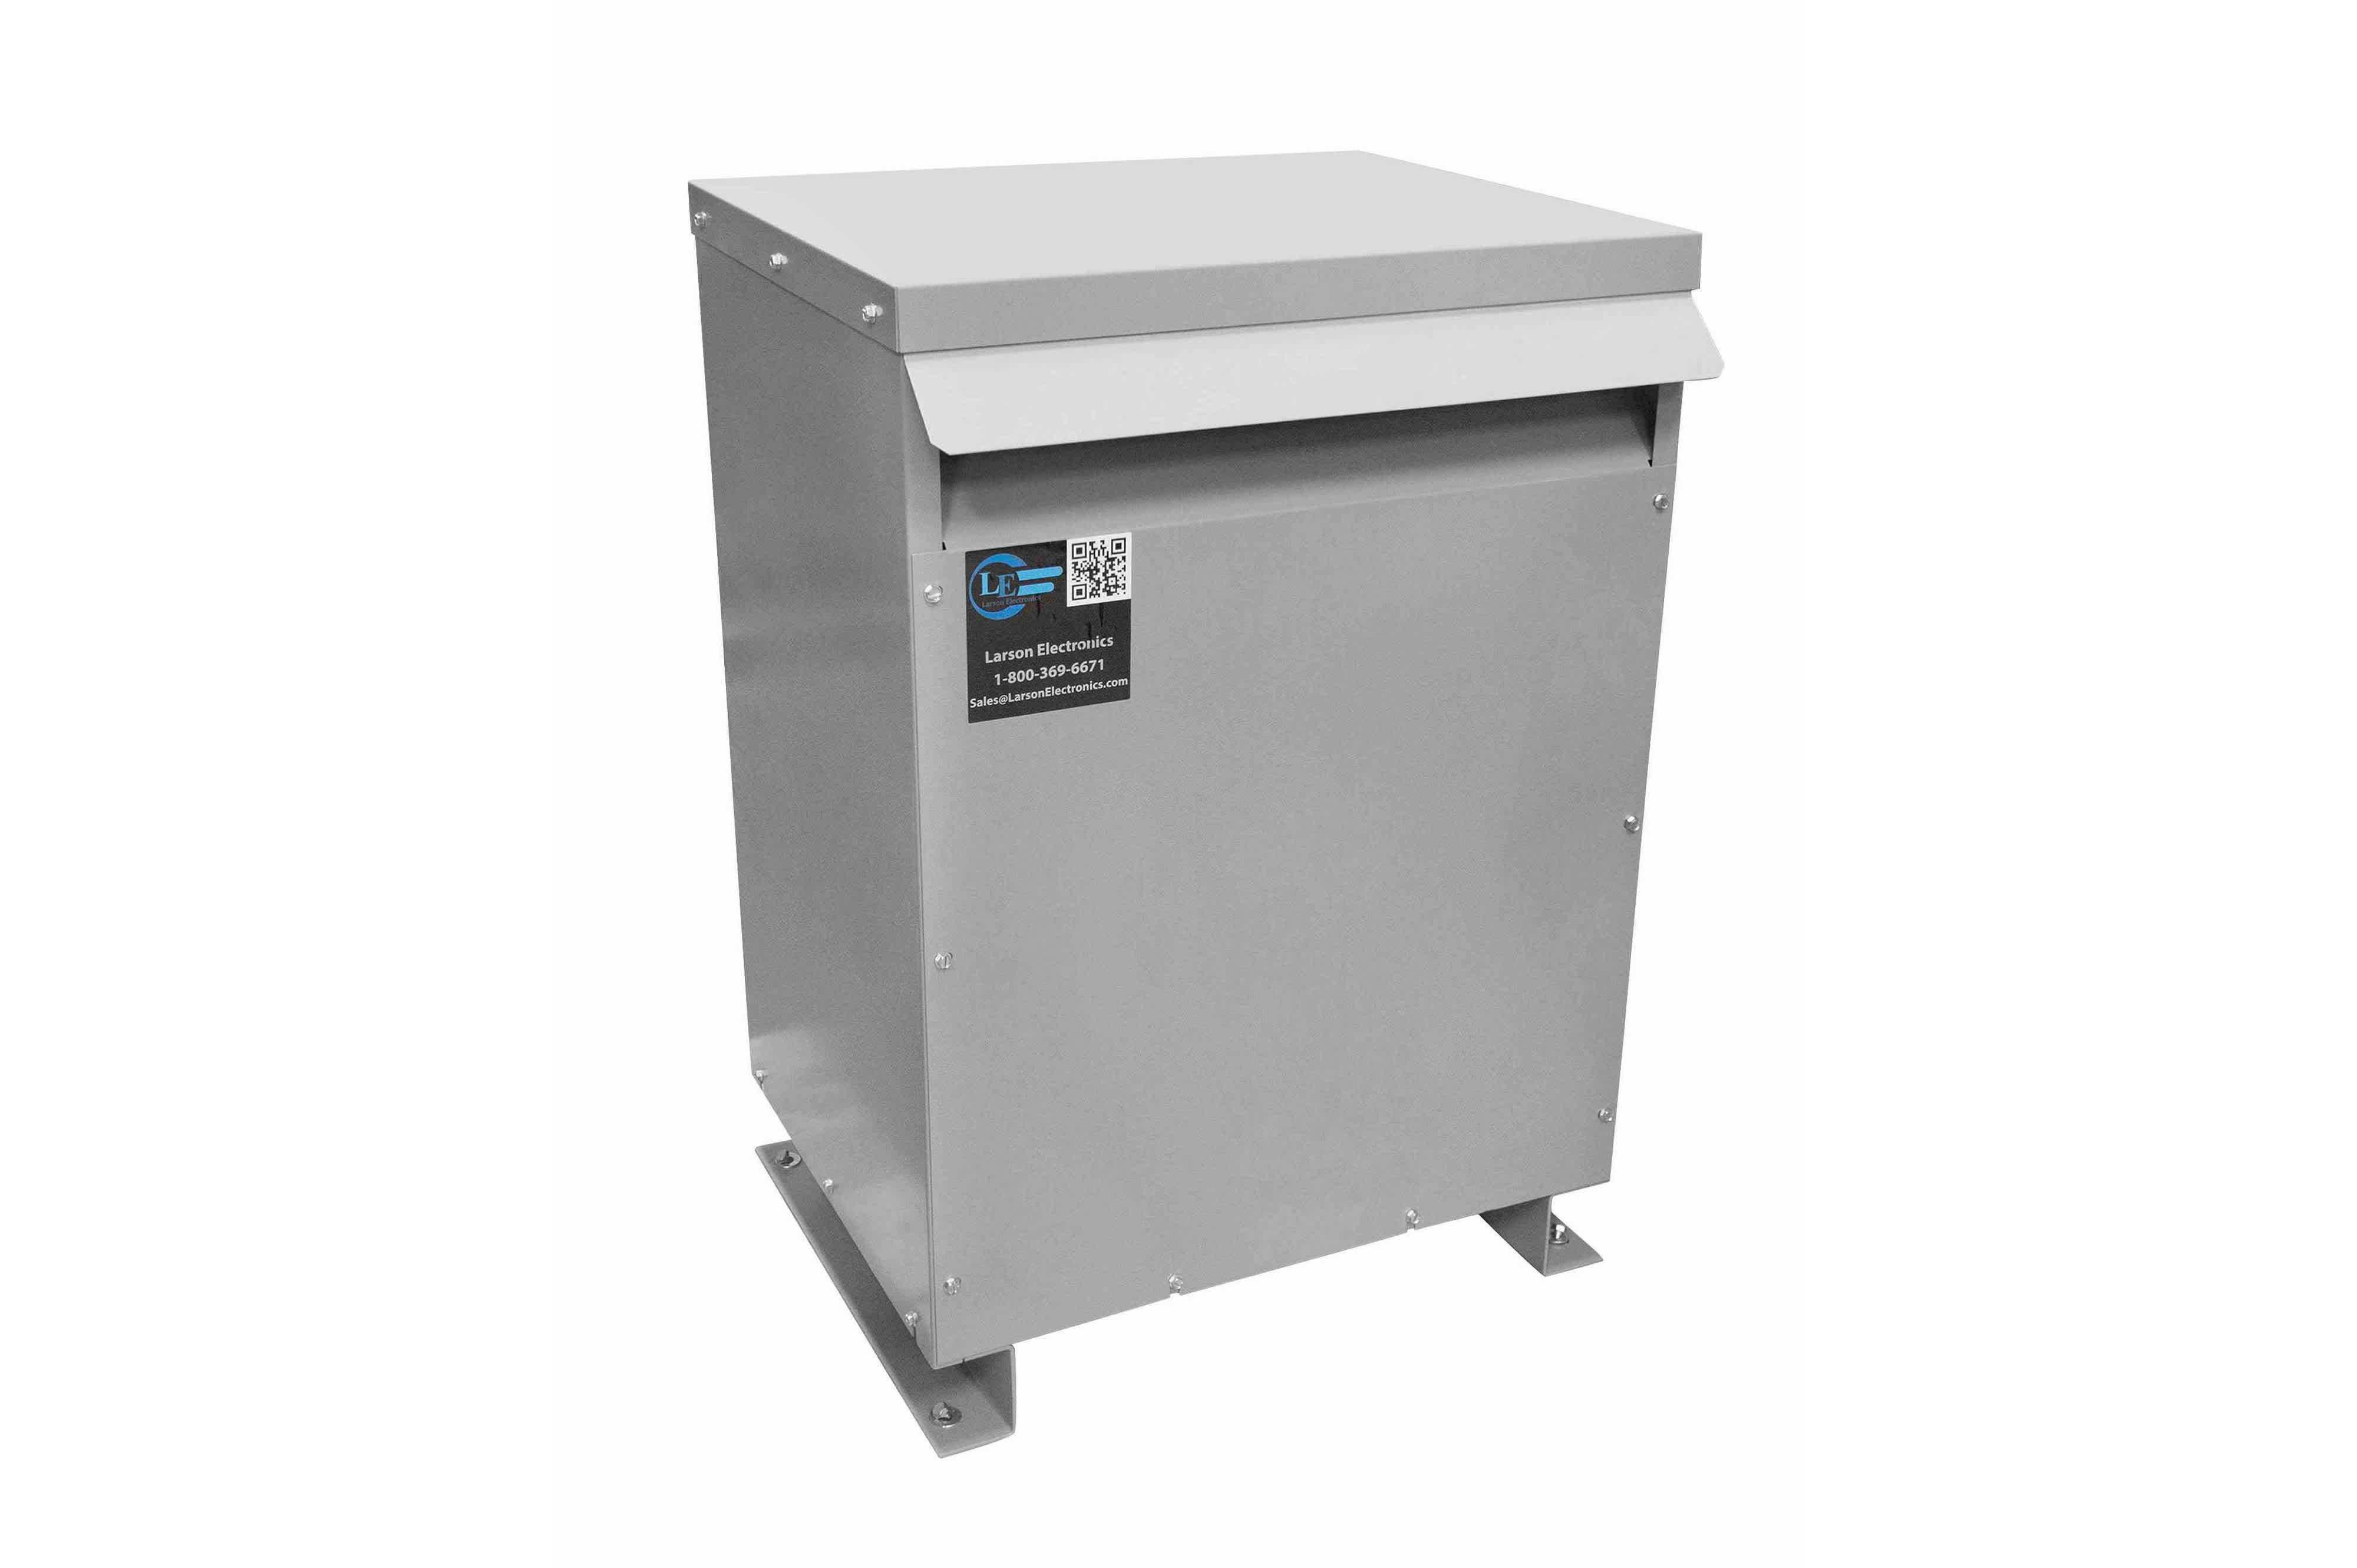 600 kVA 3PH Isolation Transformer, 400V Wye Primary, 240V Delta Secondary, N3R, Ventilated, 60 Hz